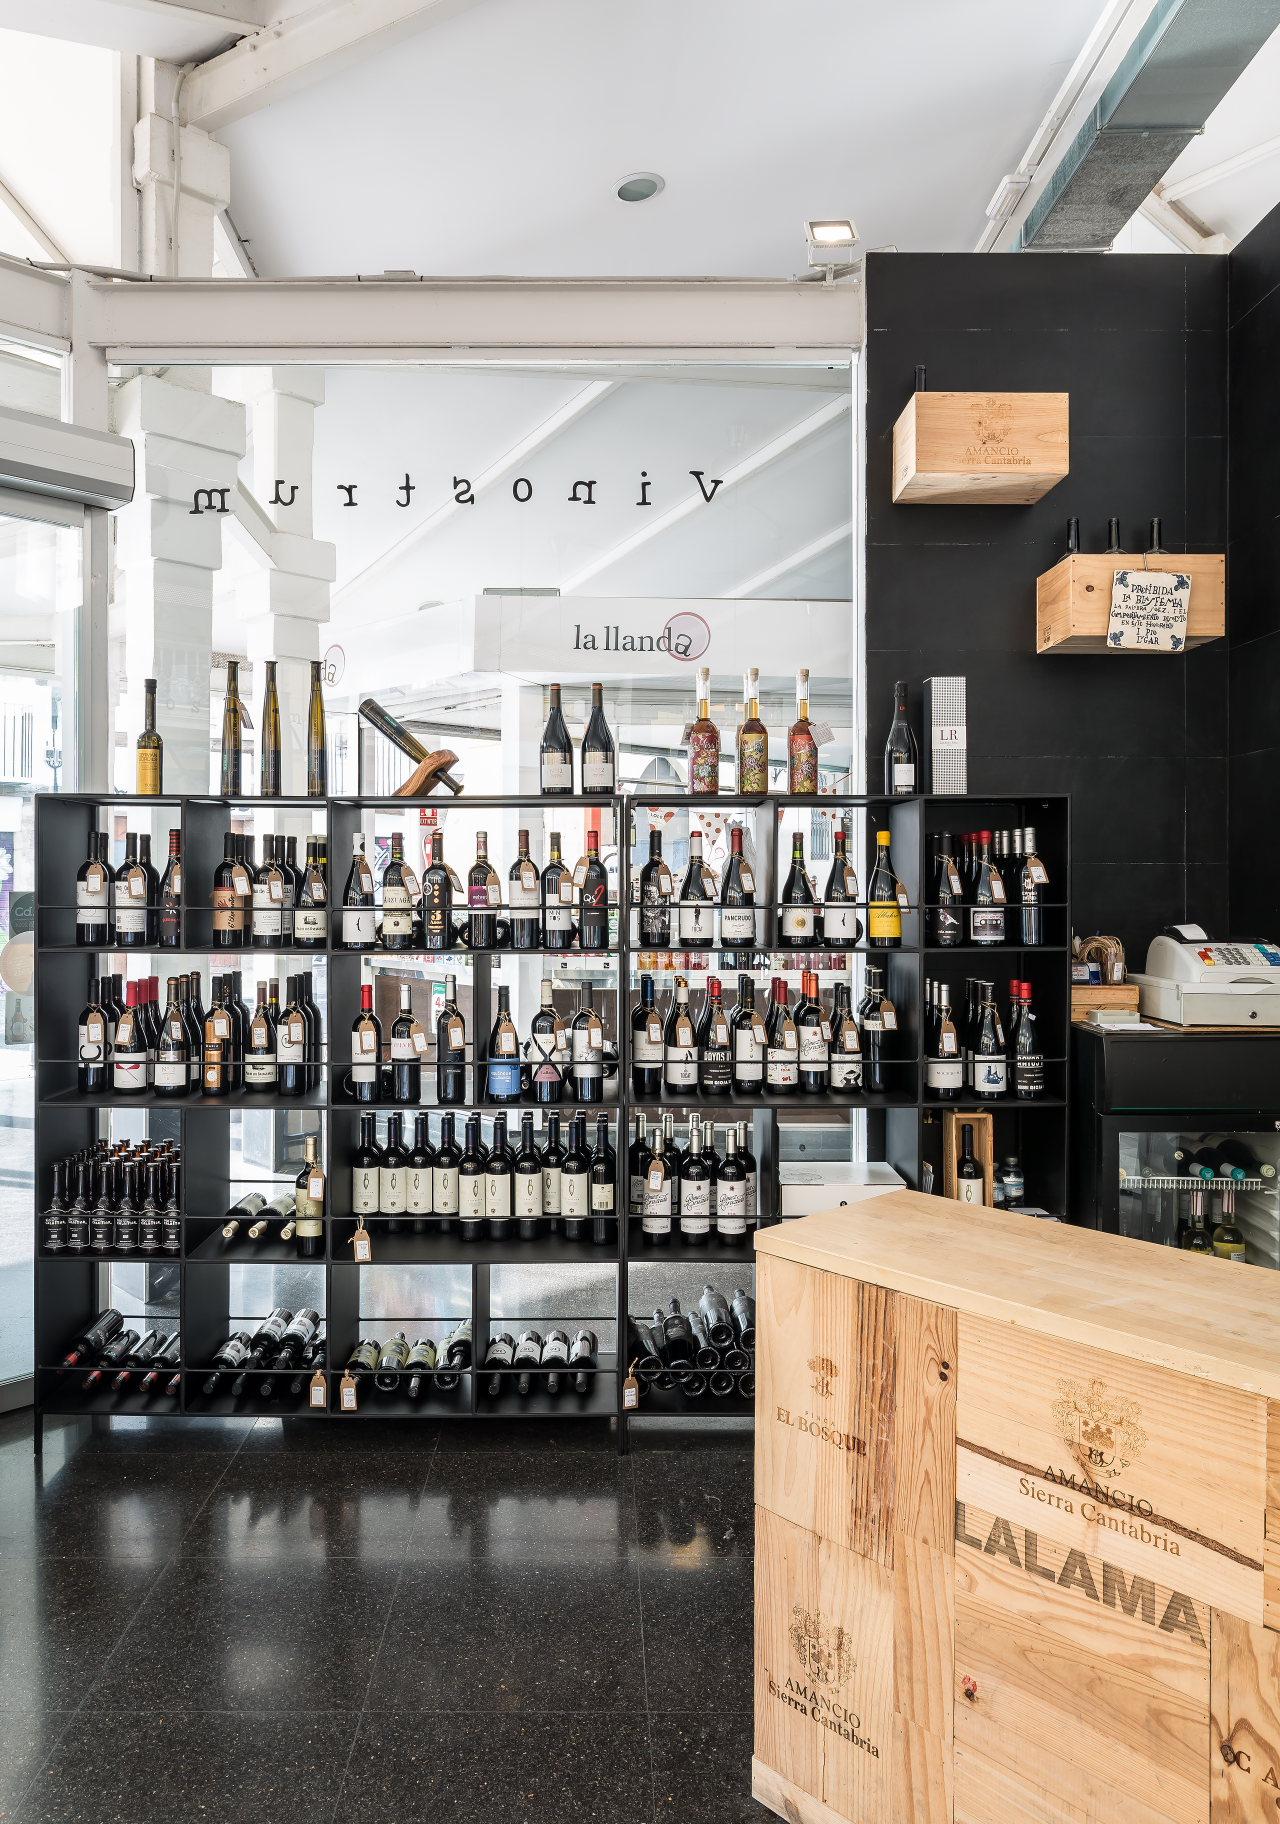 fotografia-arquitectura-valencia-german-cabo-paseo-globo-vinostrum-mercado-mossen-sorell (3)